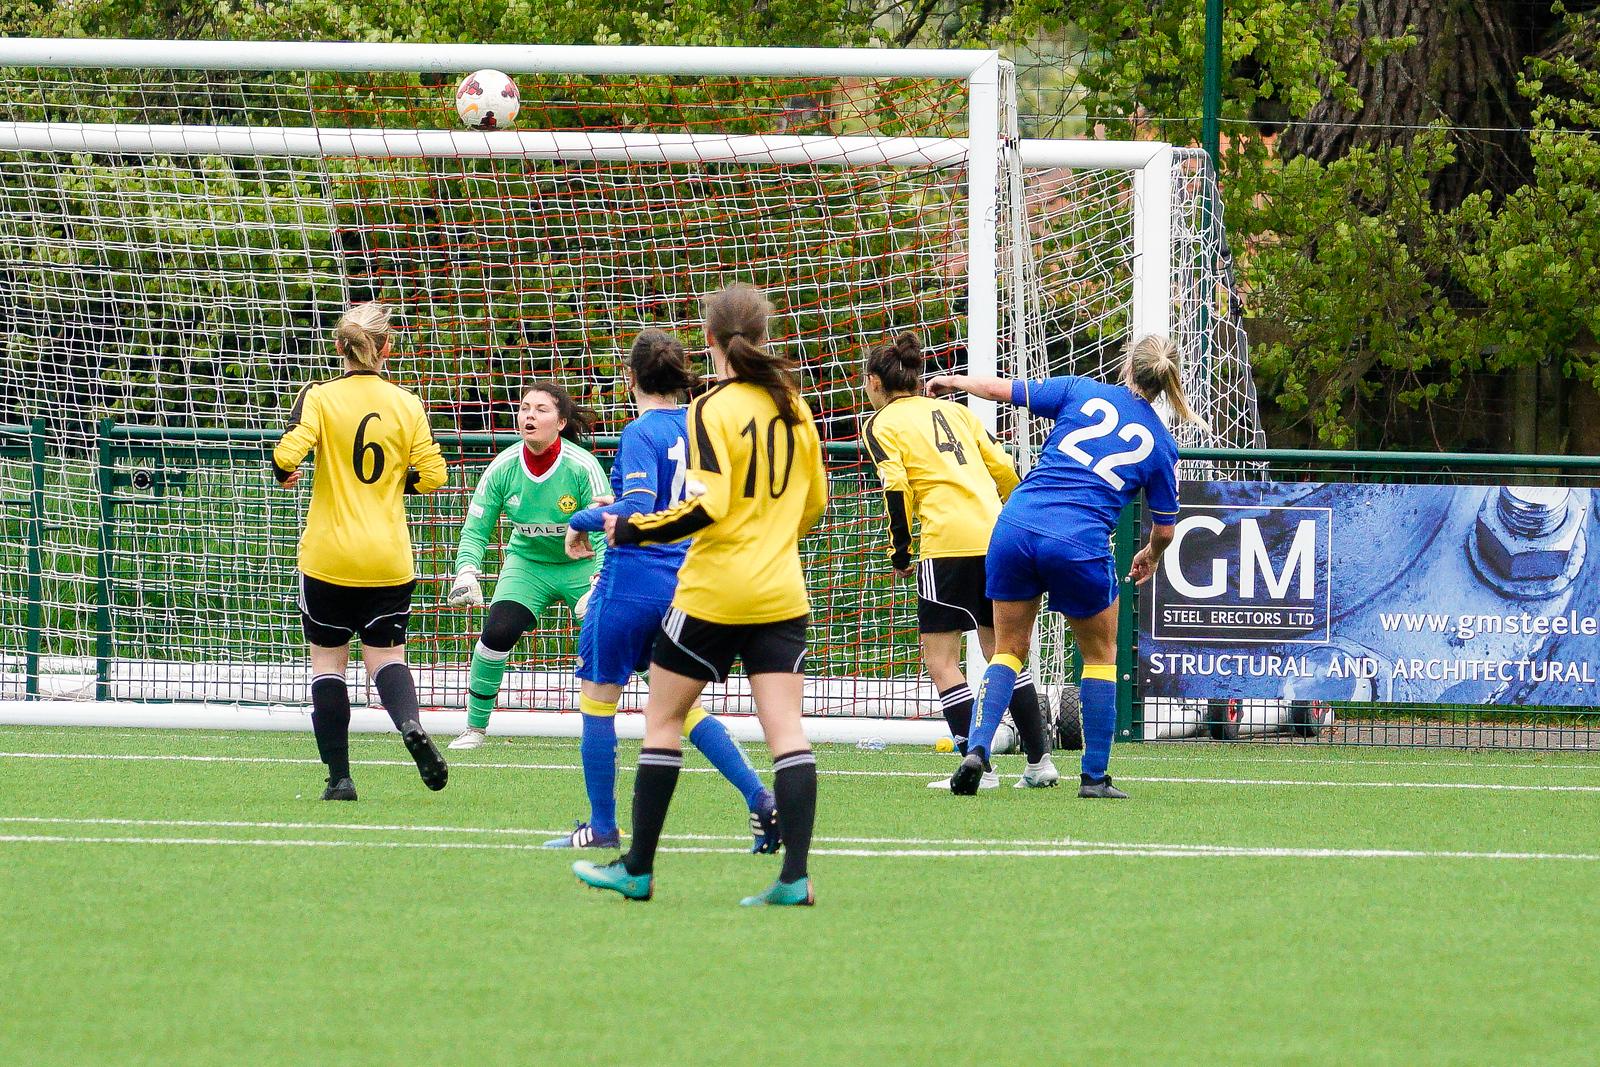 Crawley Wasps Ladies vs AFC Wimbledon on April 29, 2018 at Steyning Town Football Club, Steyning. Photo: Ben Davidson, www.bendavidsonphotography.com